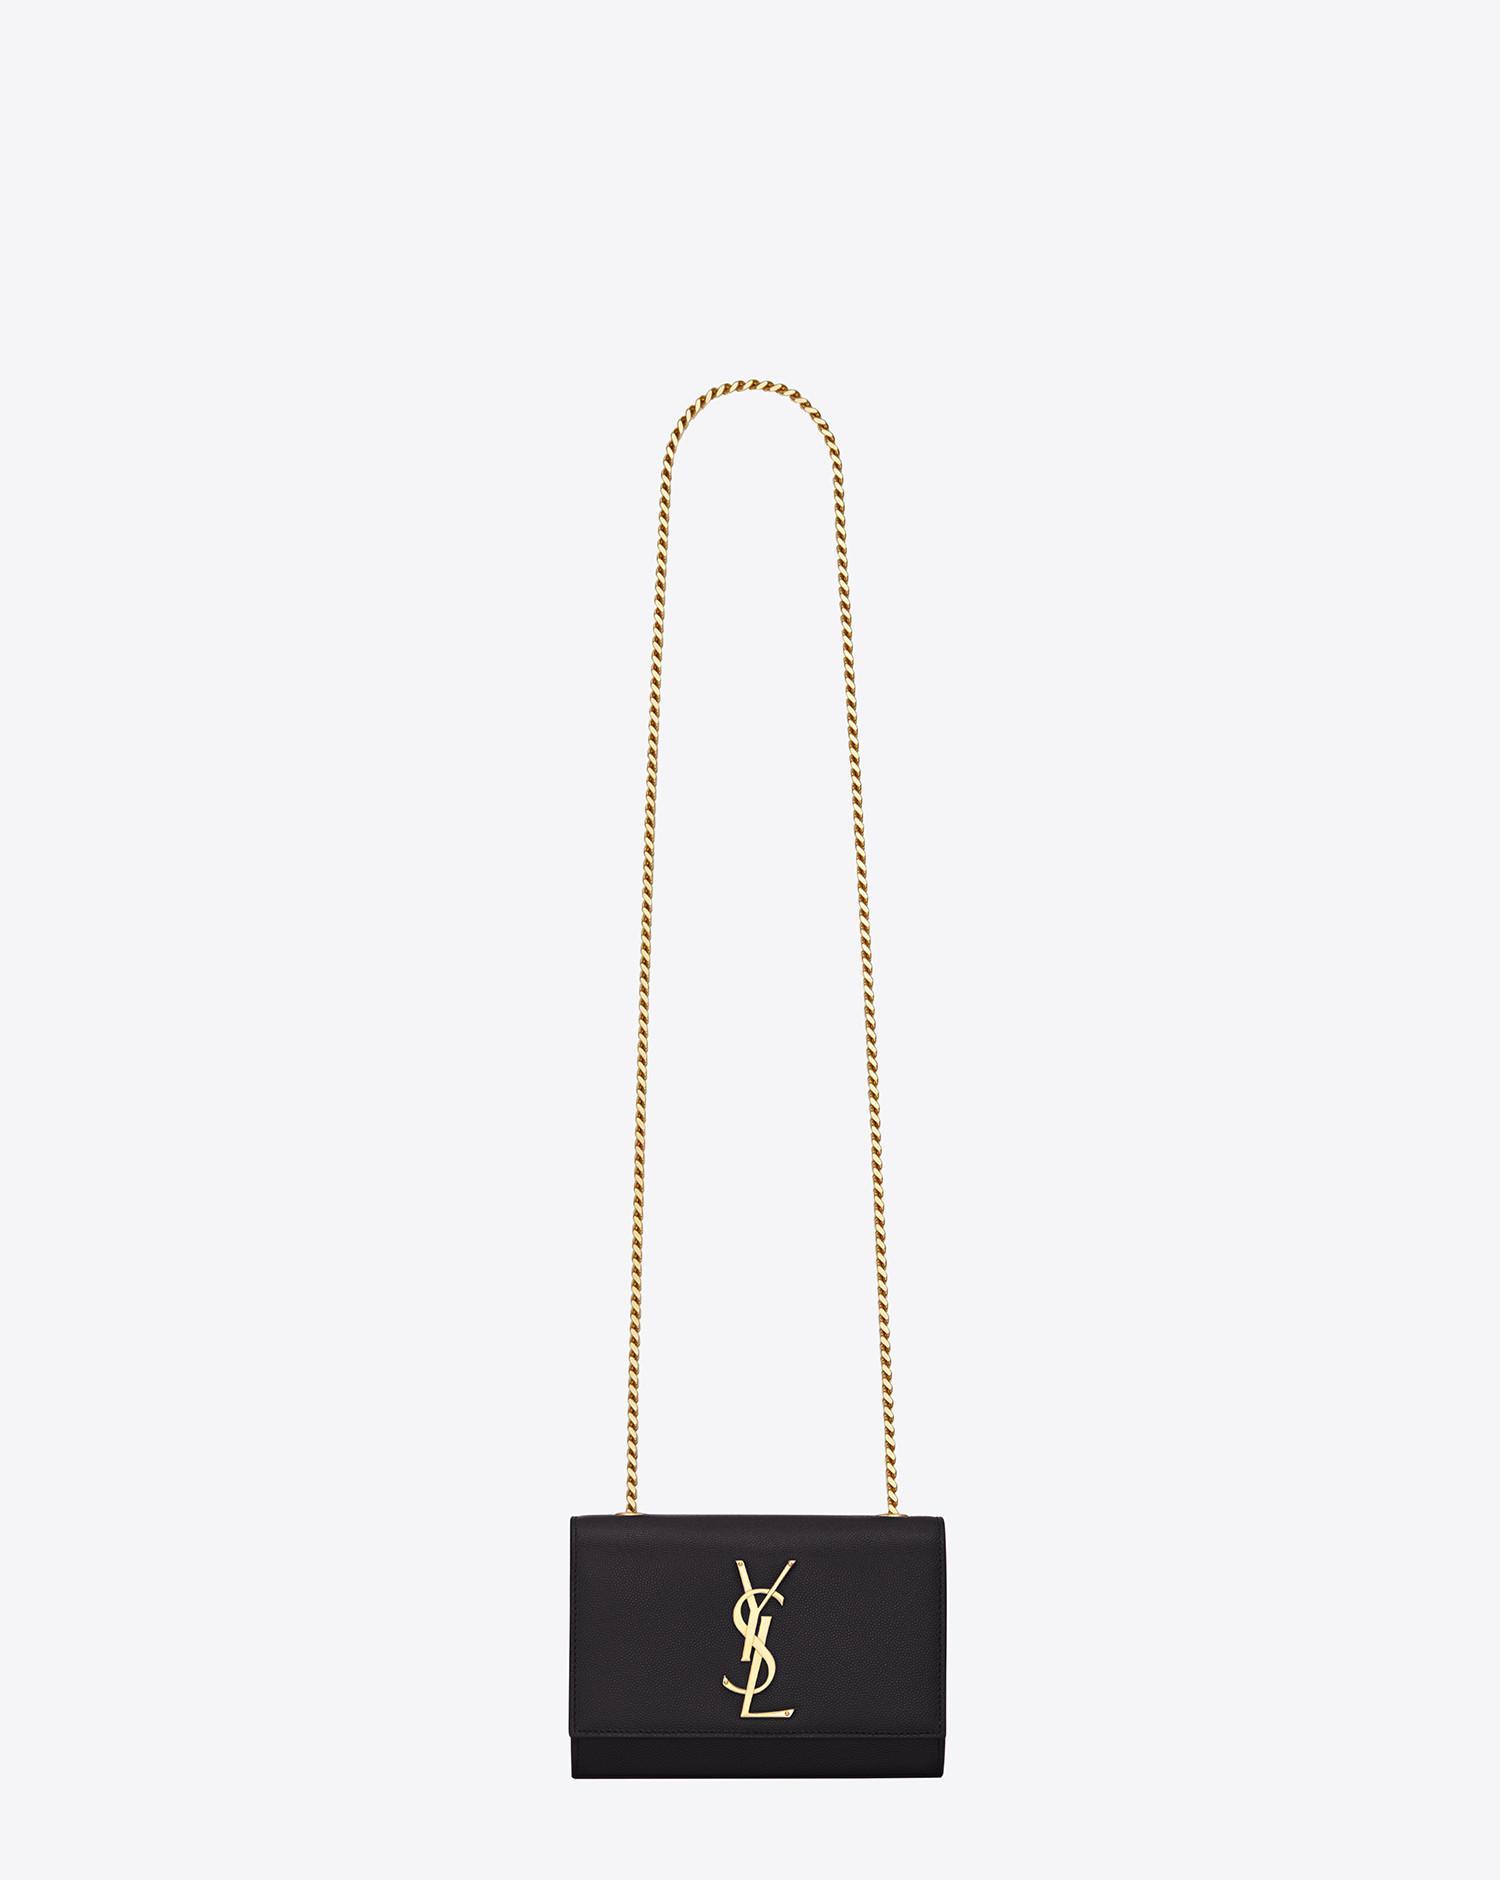 c1f8471a6b Saint Laurent - Black Classic Small Monogram Leather Shoulder Bag - Lyst.  View fullscreen